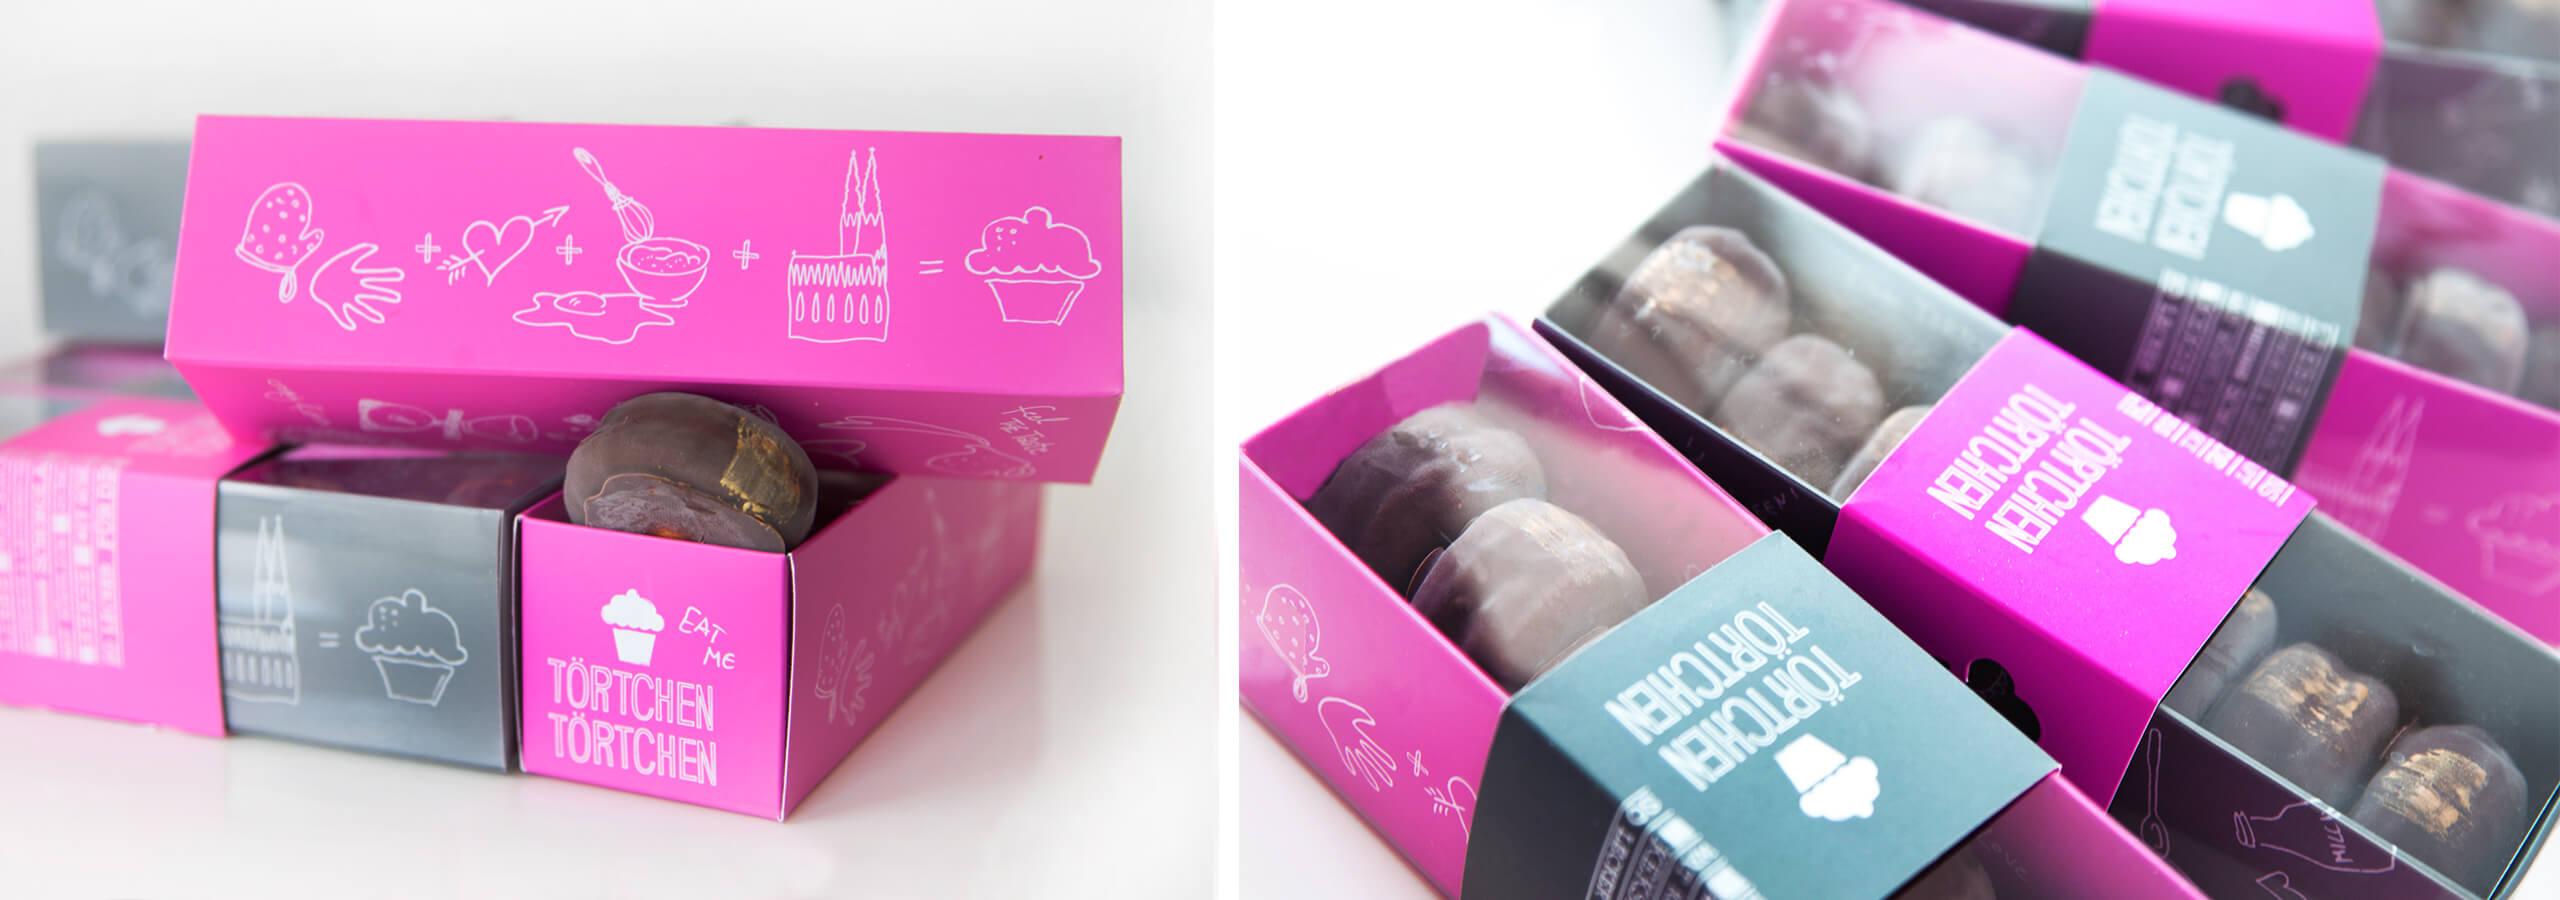 Packaging mit Illustration